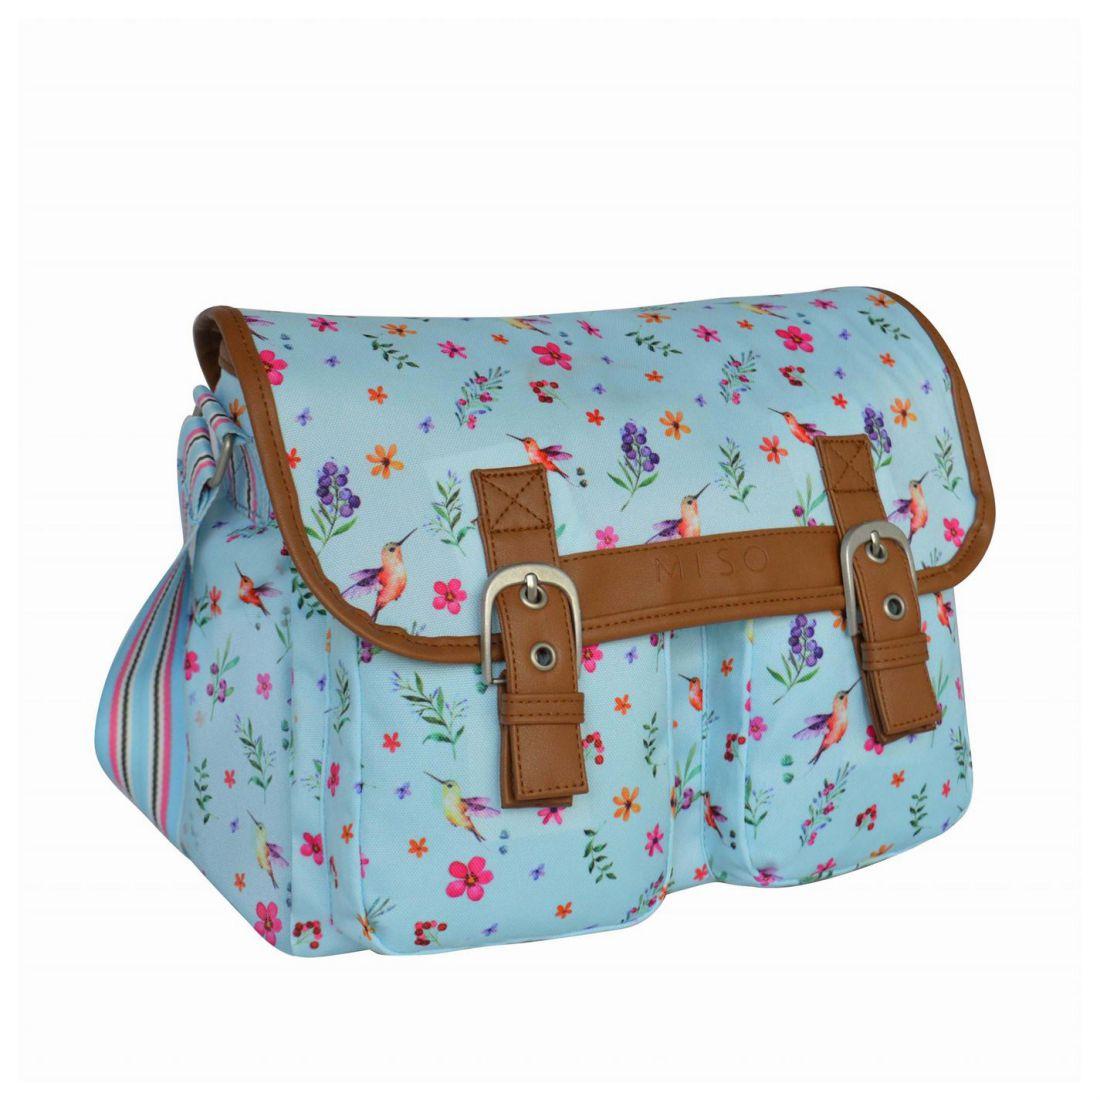 d625117fae9b Details about Miso Canvas Satchel 74 Ladies Shoulder Pack Case Sack Holdall